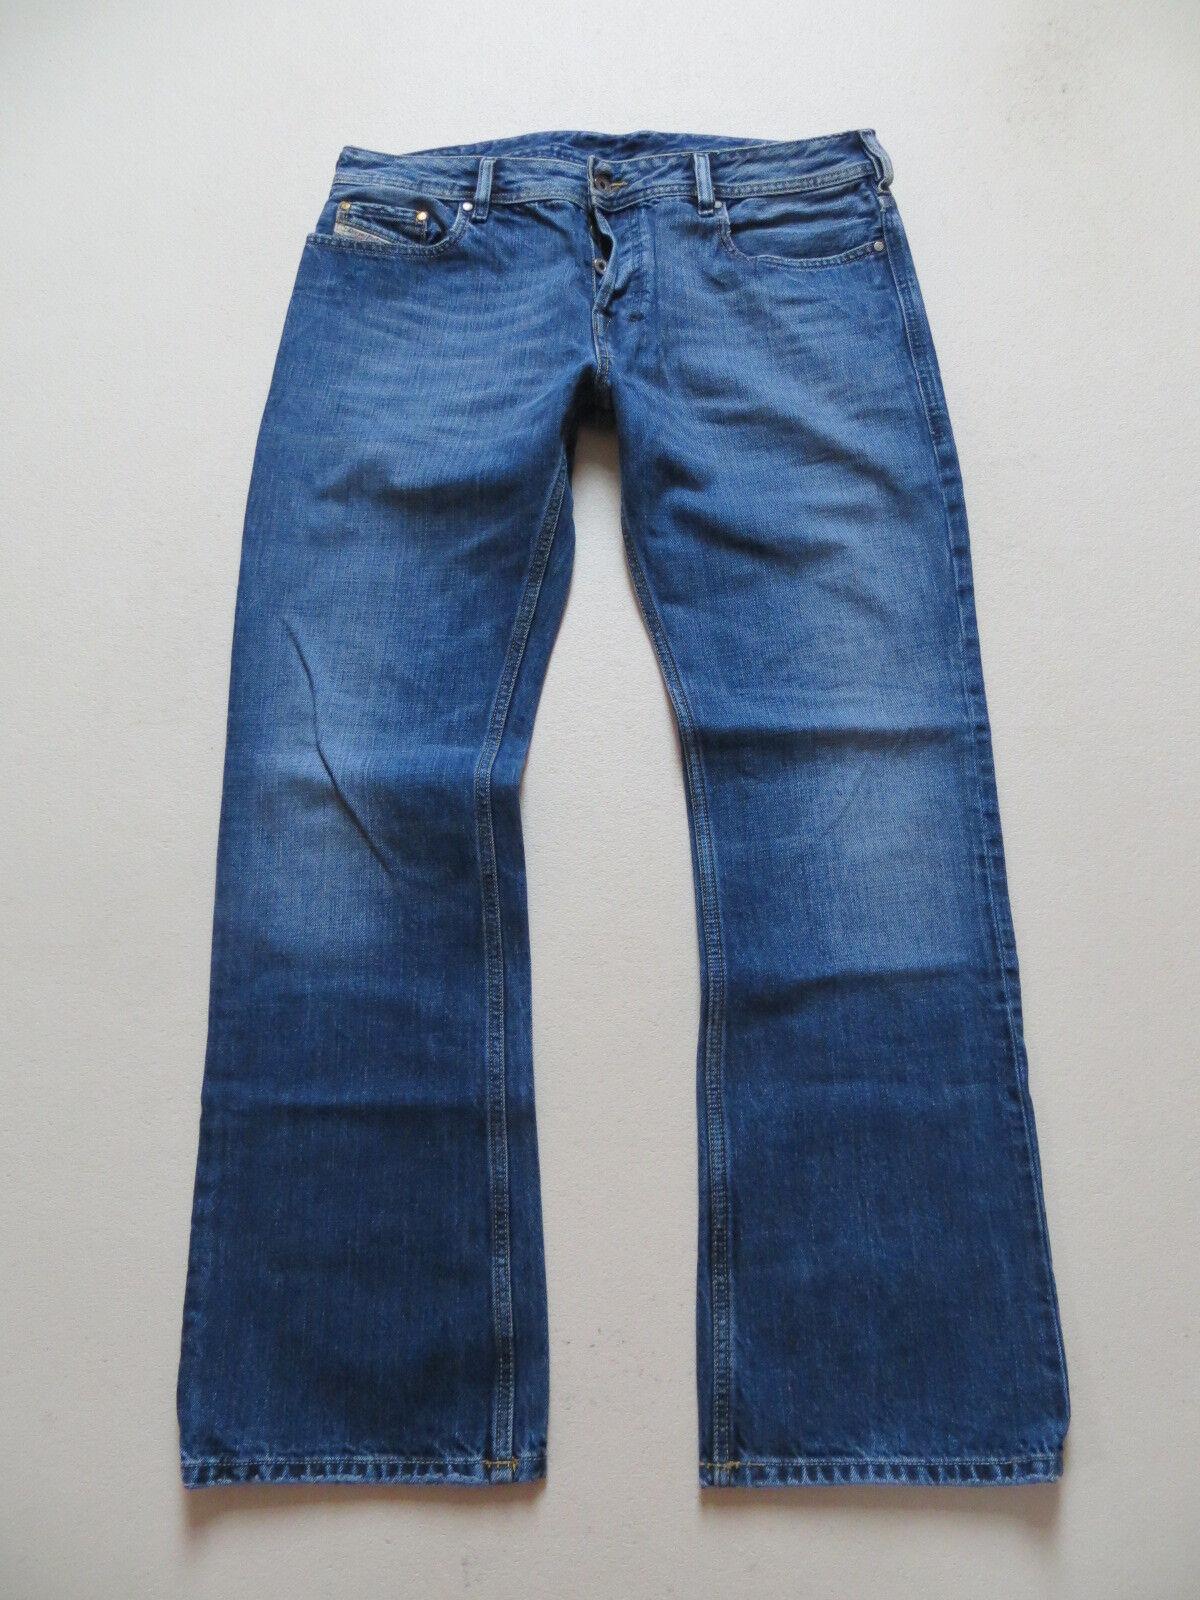 Diesel ZATINY wash 008FA Jeans Hose W 34  L 32, Bootcut Denim mit TOP Waschung